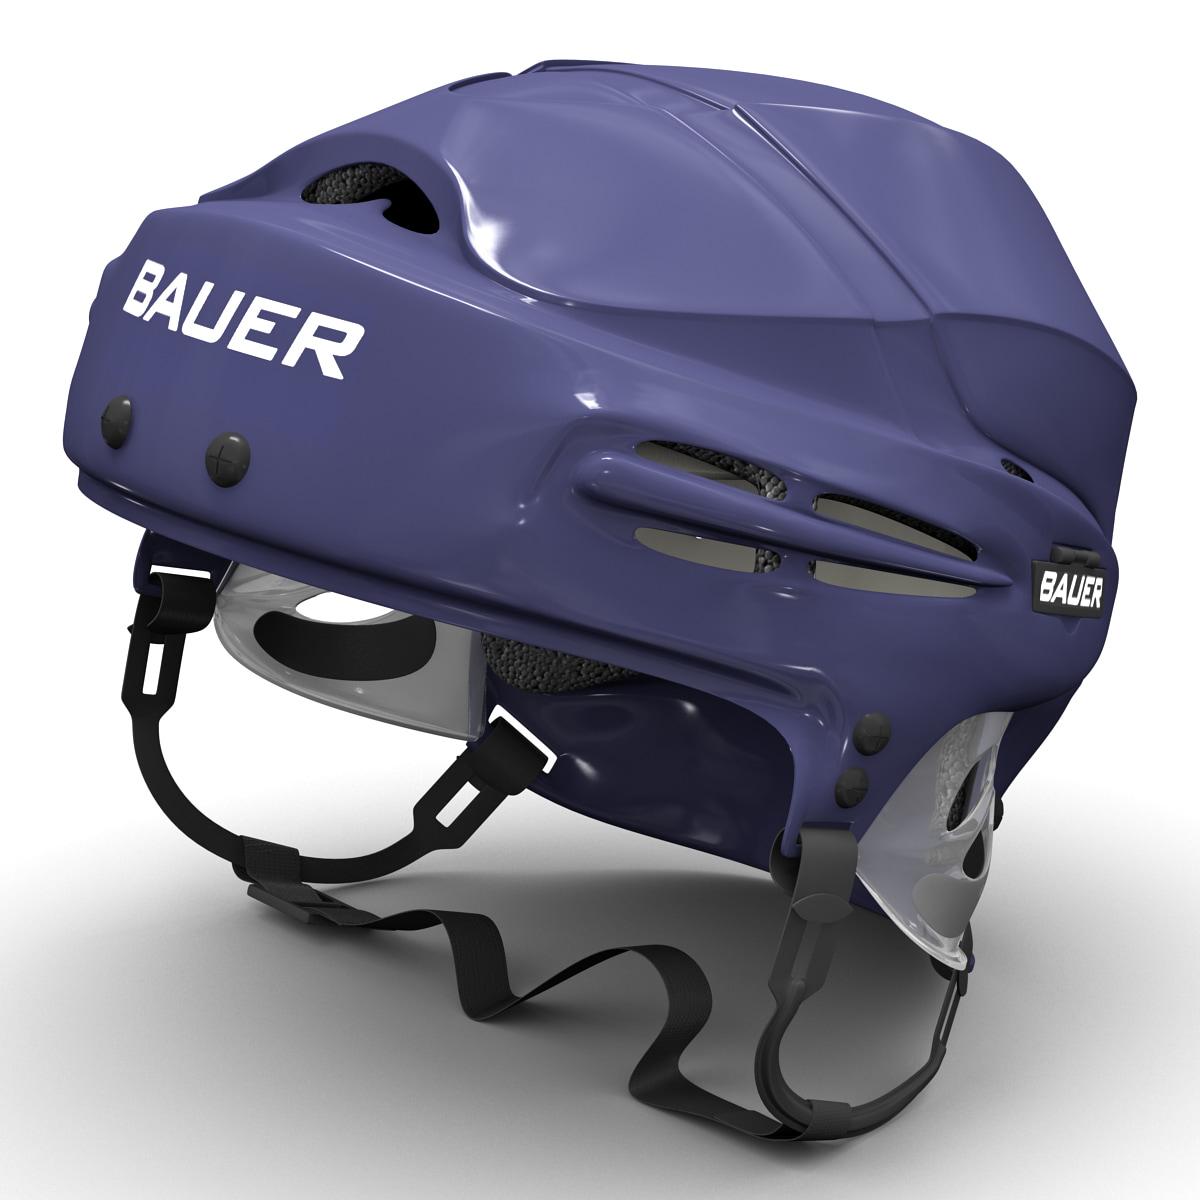 Hockey_Helmet_Bauer_5100_001.jpg